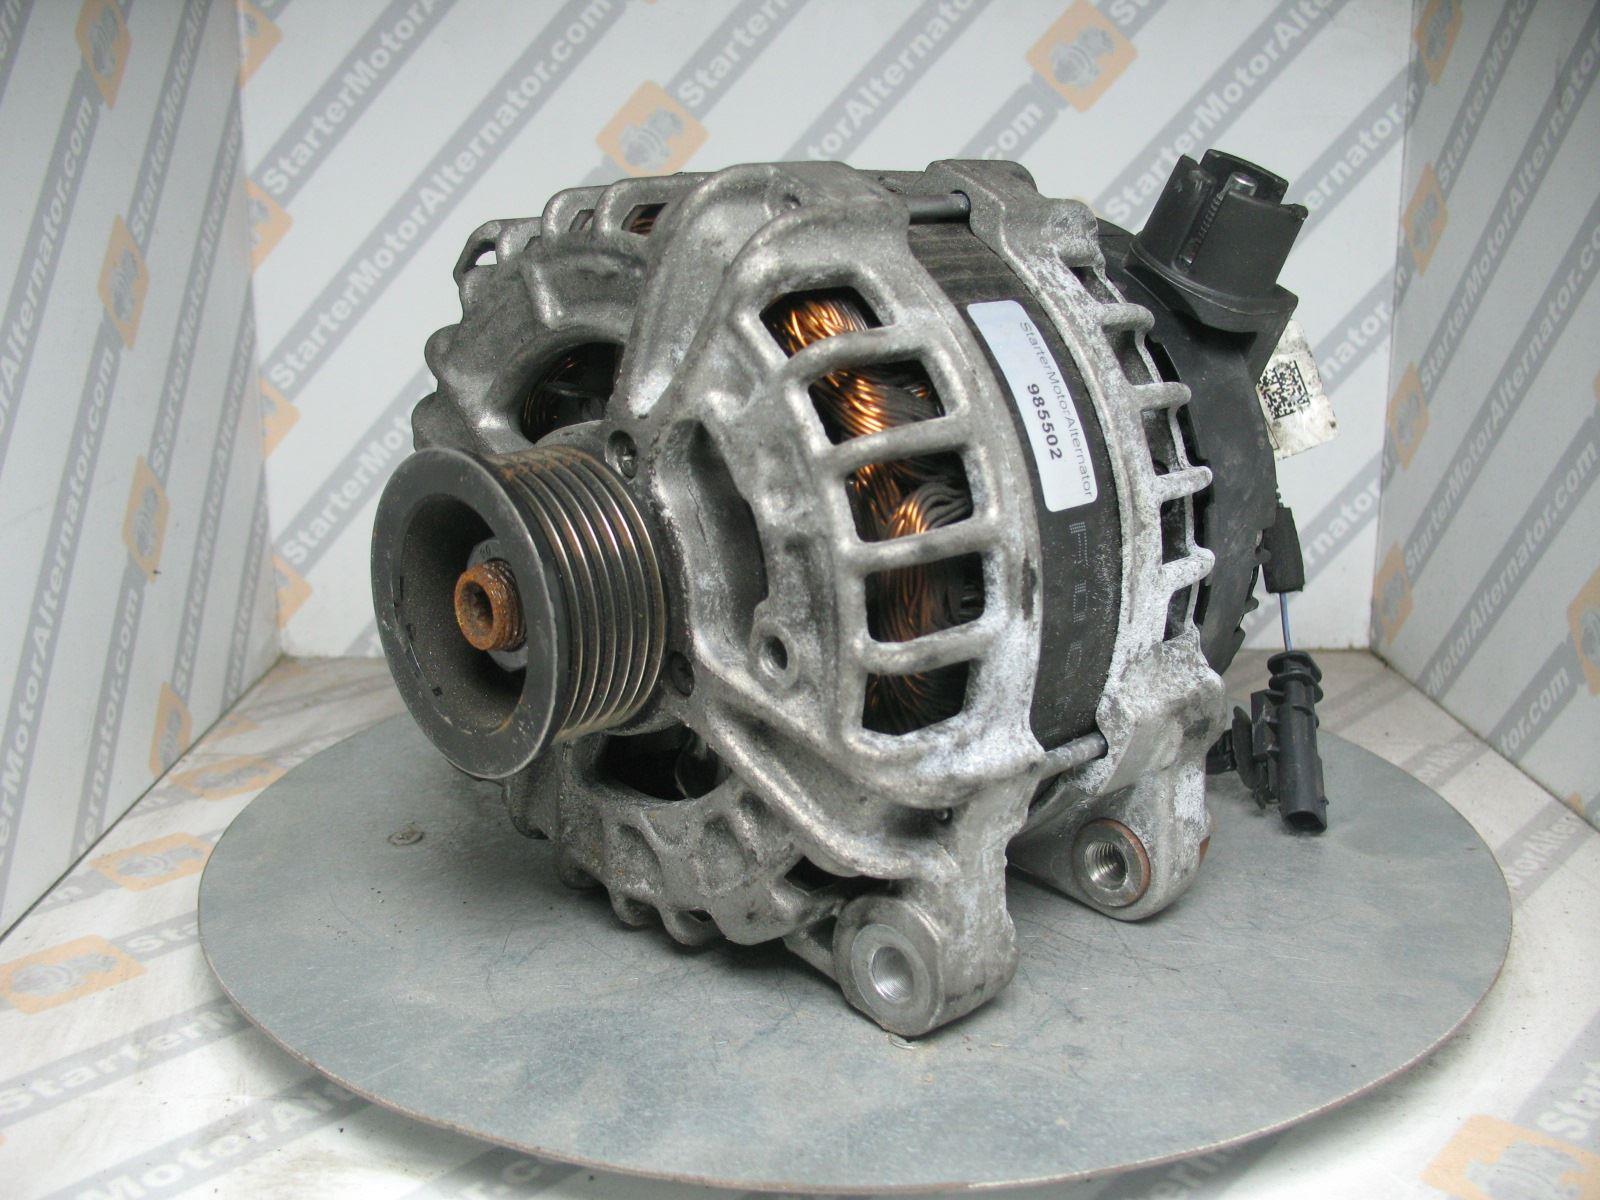 XIG1416 Alternator For Jaguar/Daimler / Land Rover